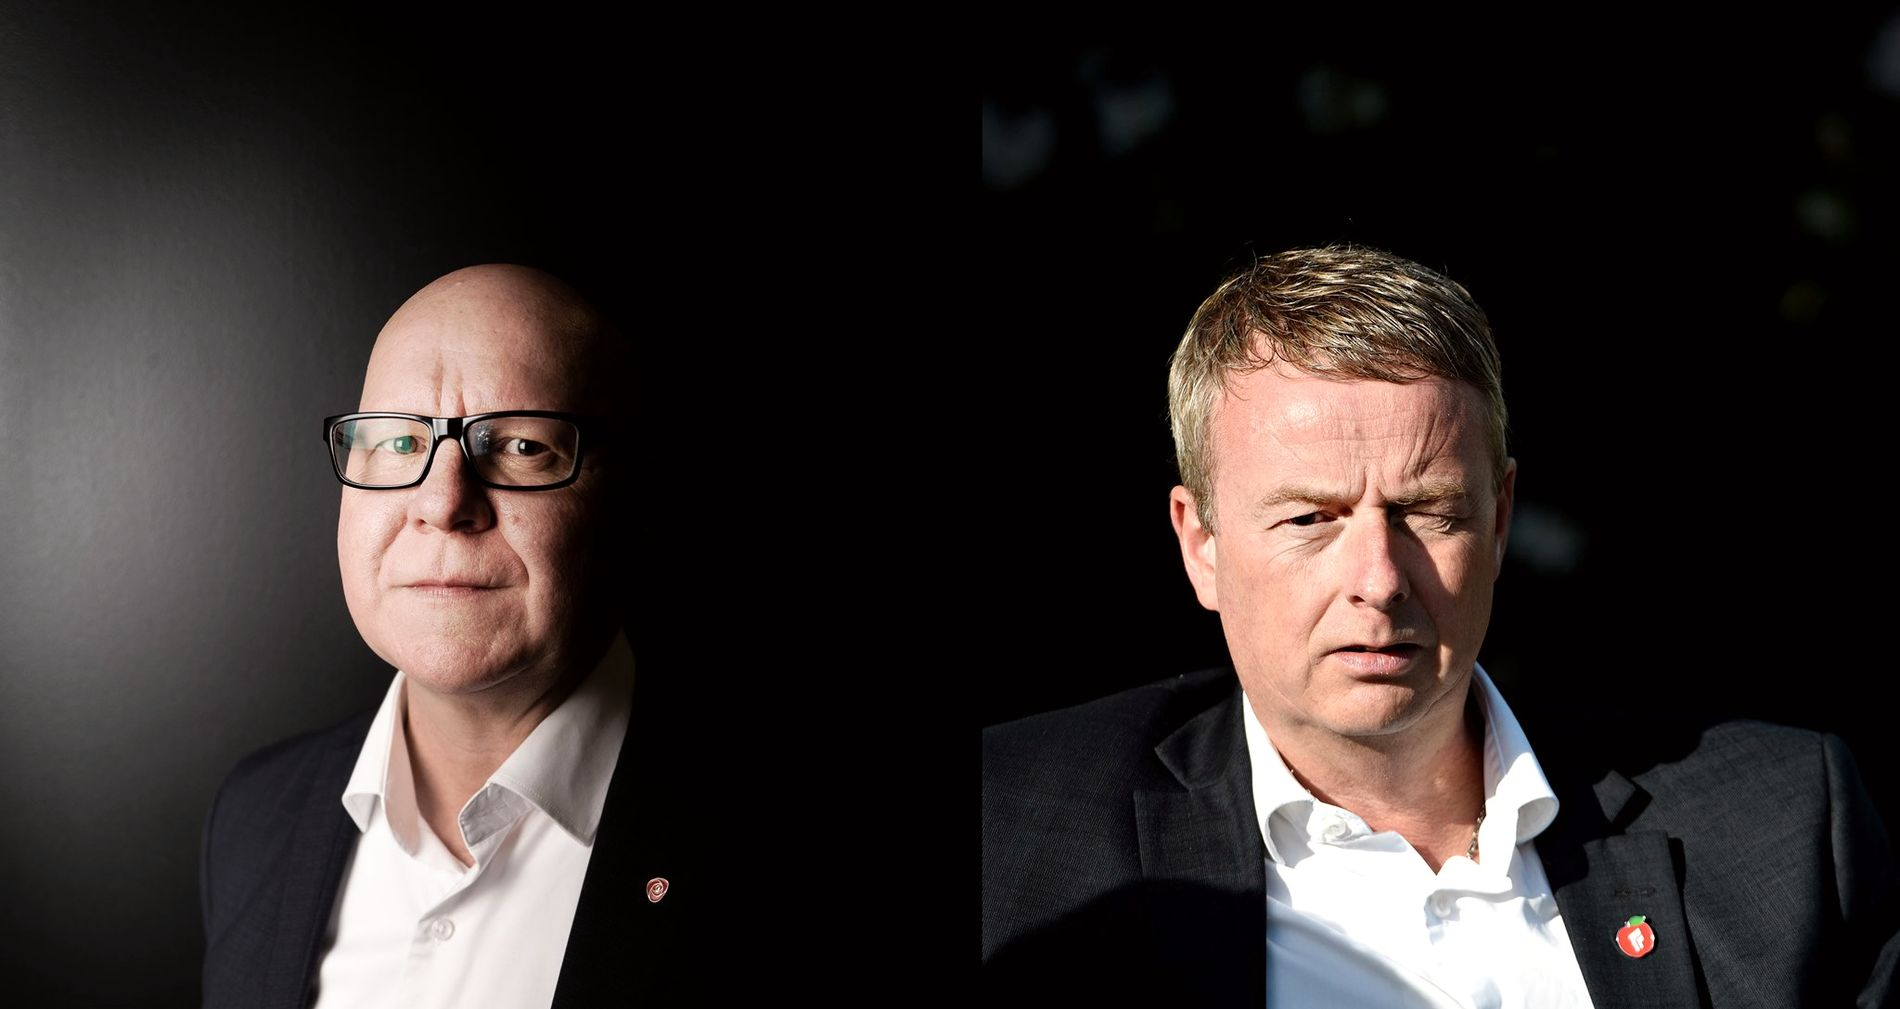 DUELL: «Hvem er best - Os eller Bergen?» Ap-byråd Rune Bakervik debatterer mot Frp-ordfører Terje Søviknes.